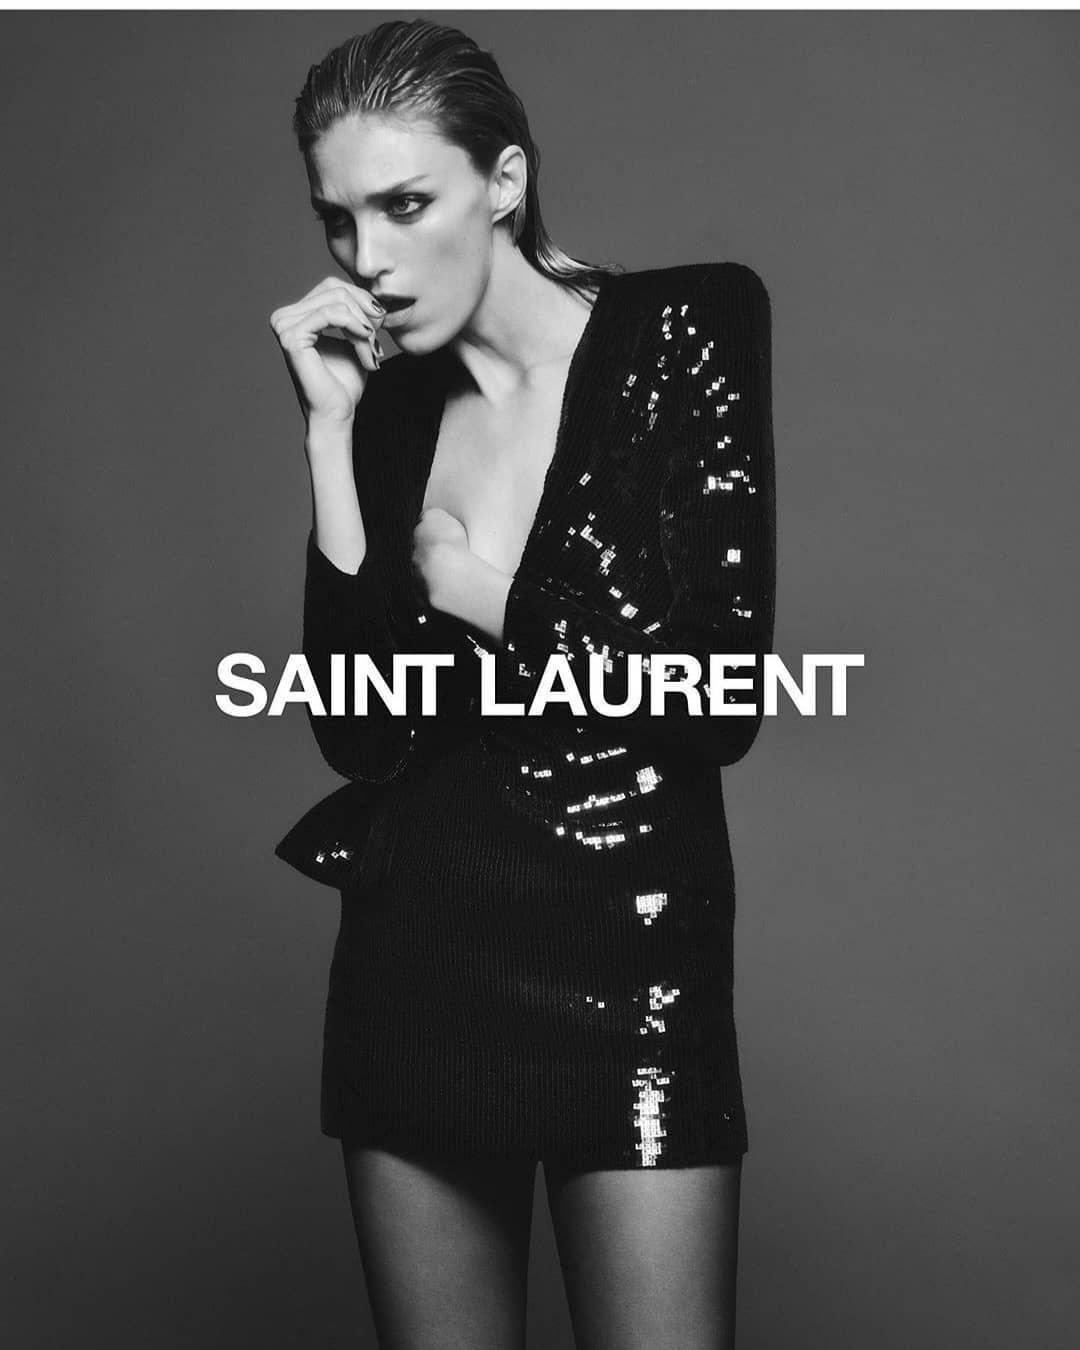 saint_laurent_fall_2019_campaign1.jpg